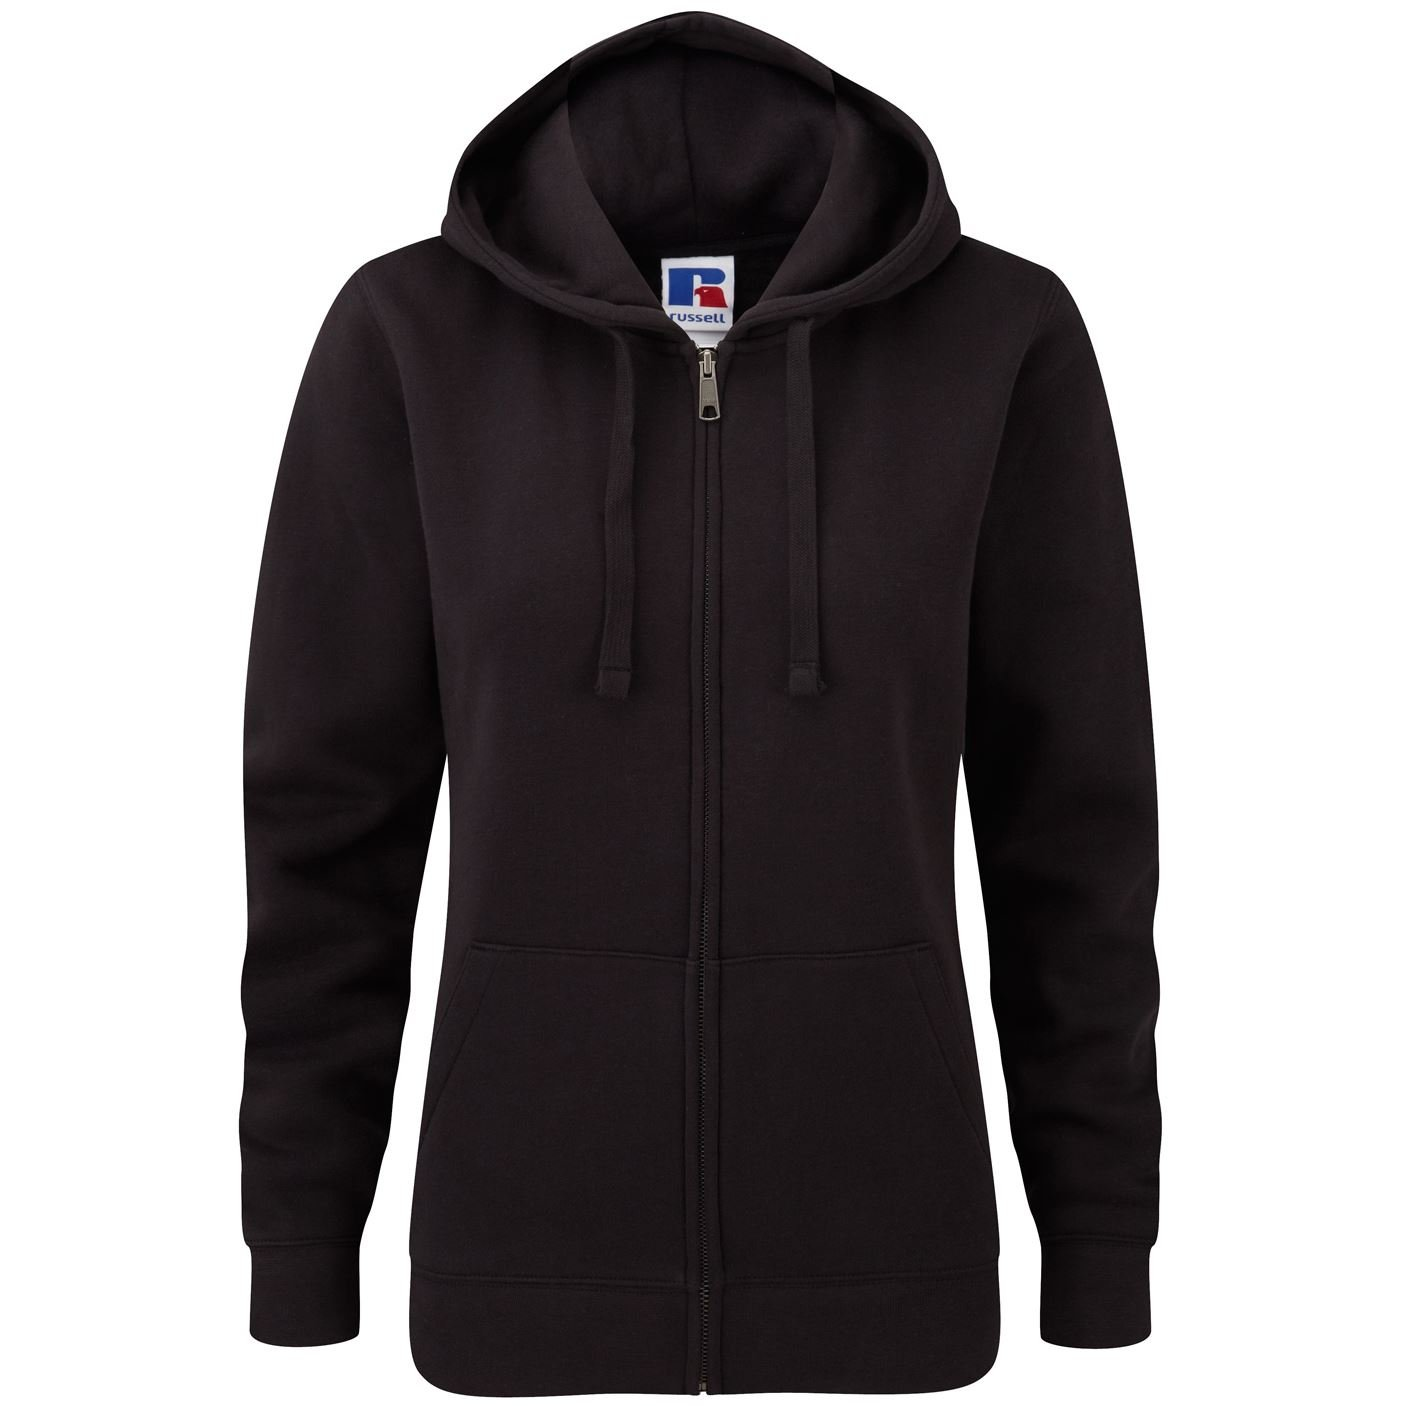 Russell-Women's authentic zipped hooded sweatshirt-